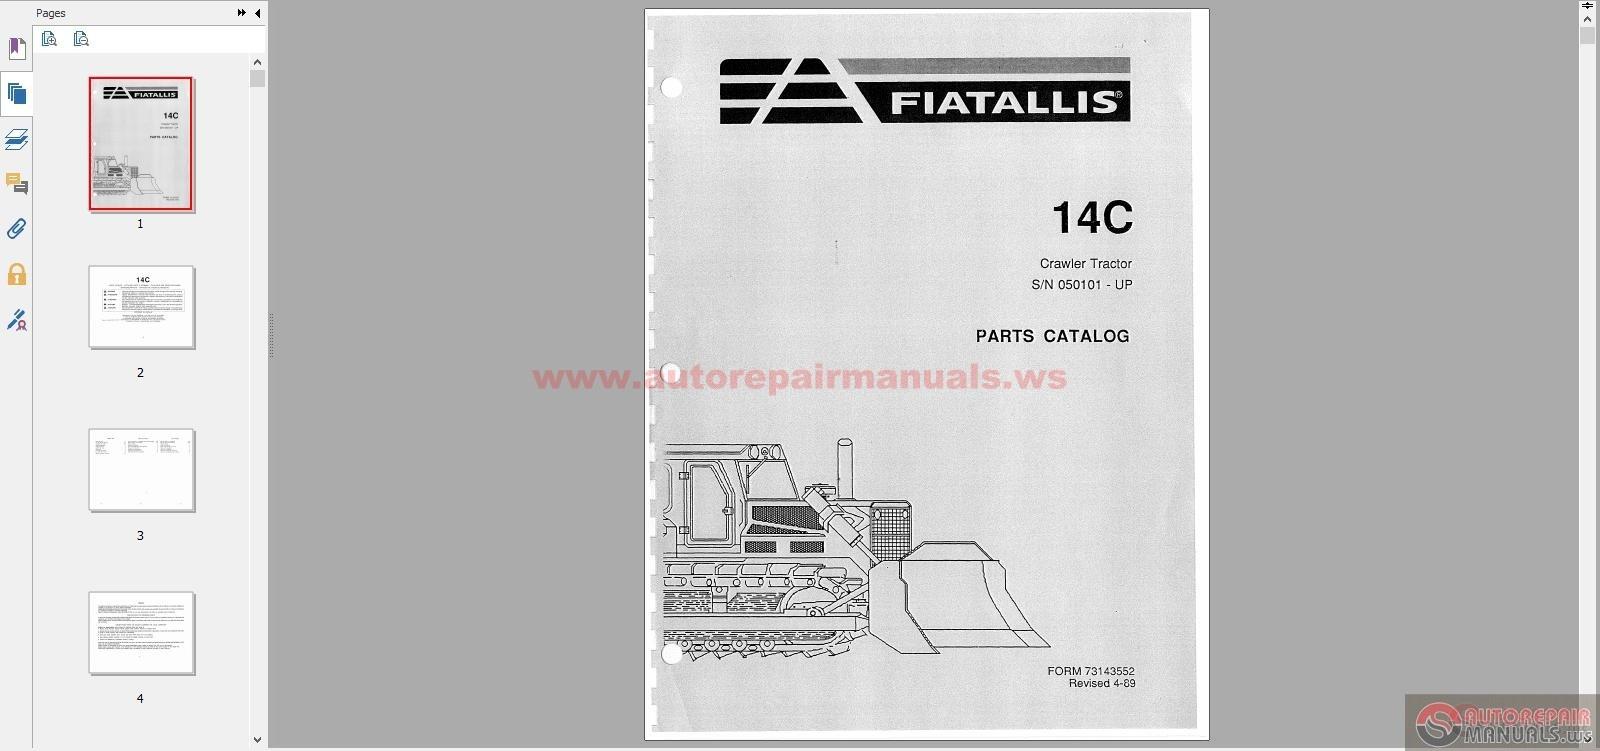 Fiat Allis 14c Parts : Fiat allis dozers c pm sn up parts book auto